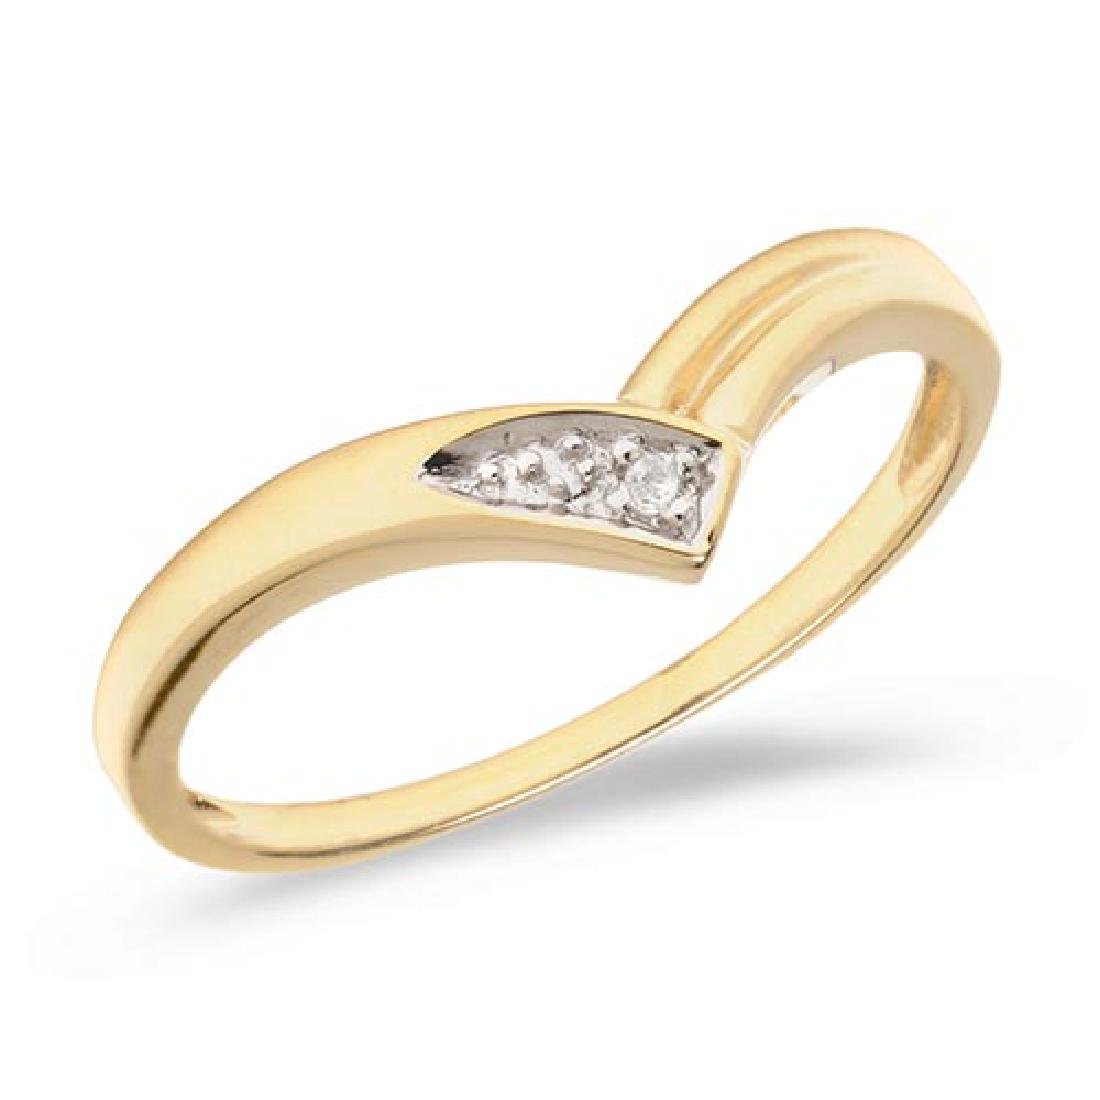 Certified 10K Yellow Gold Diamond Chevron Ring